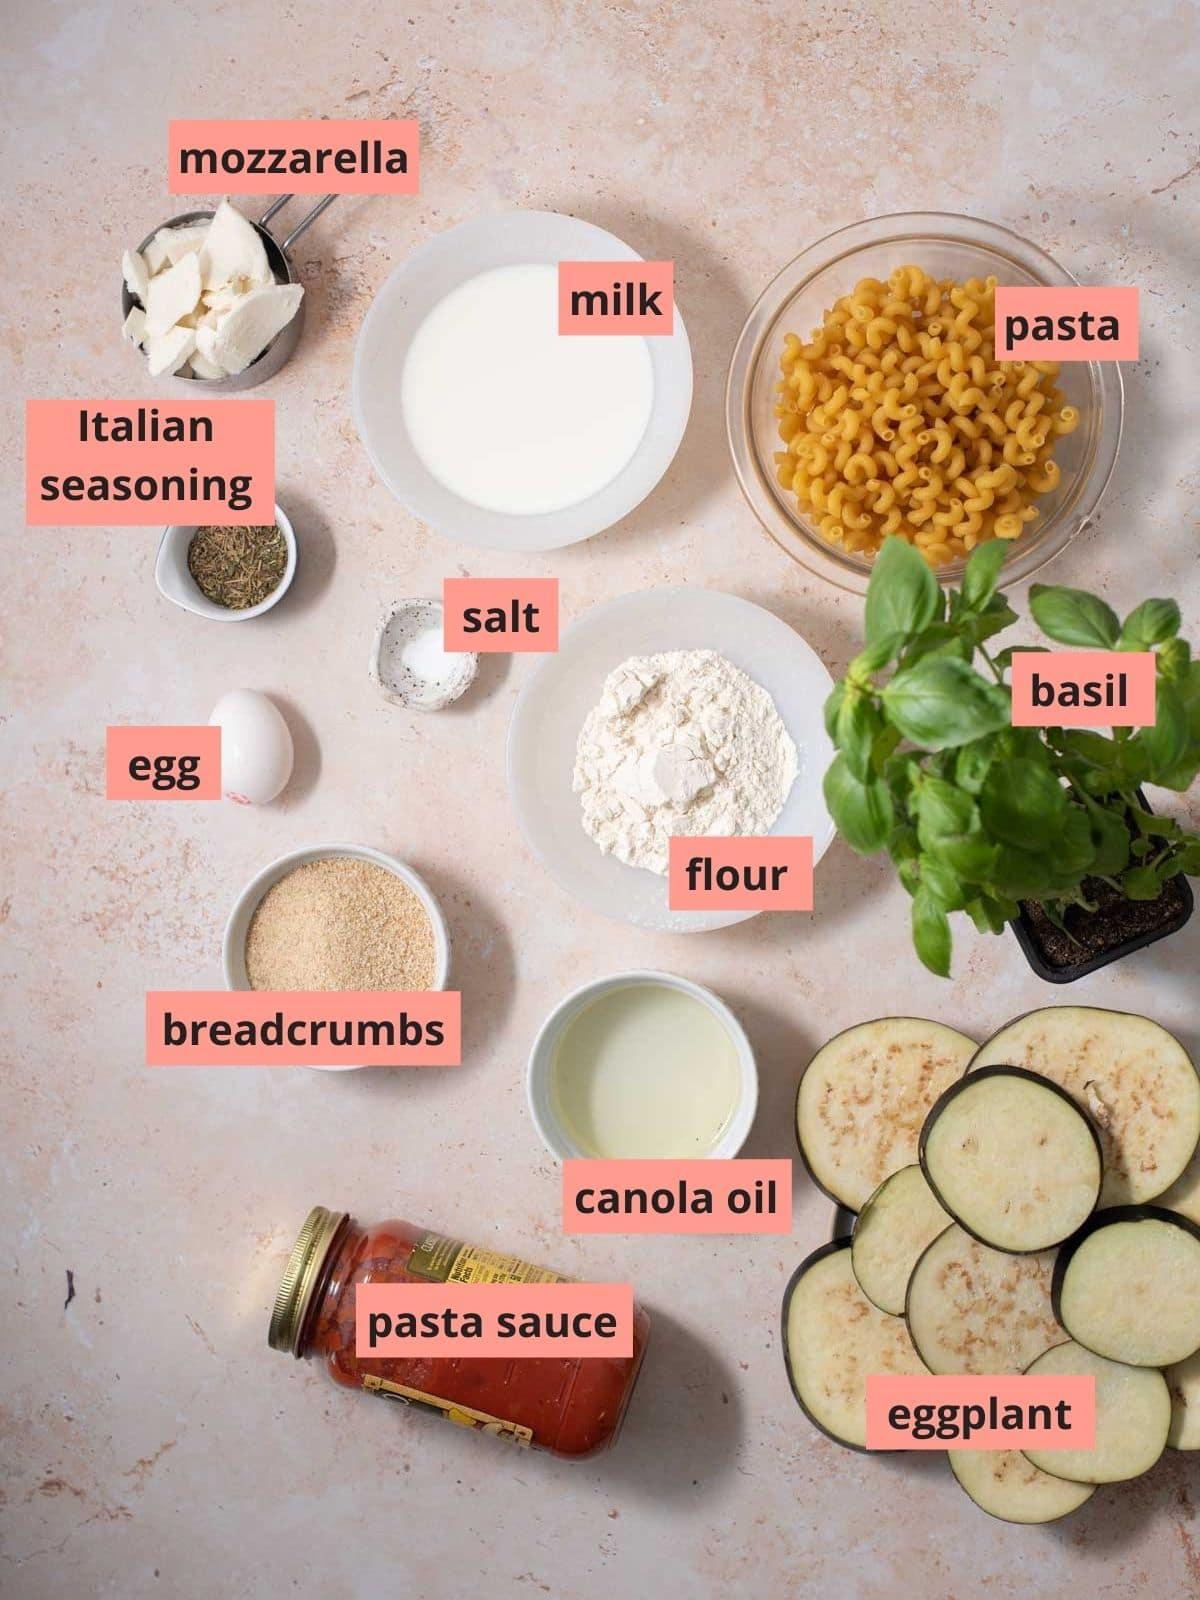 Labeled ingredients used to make eggplant bake